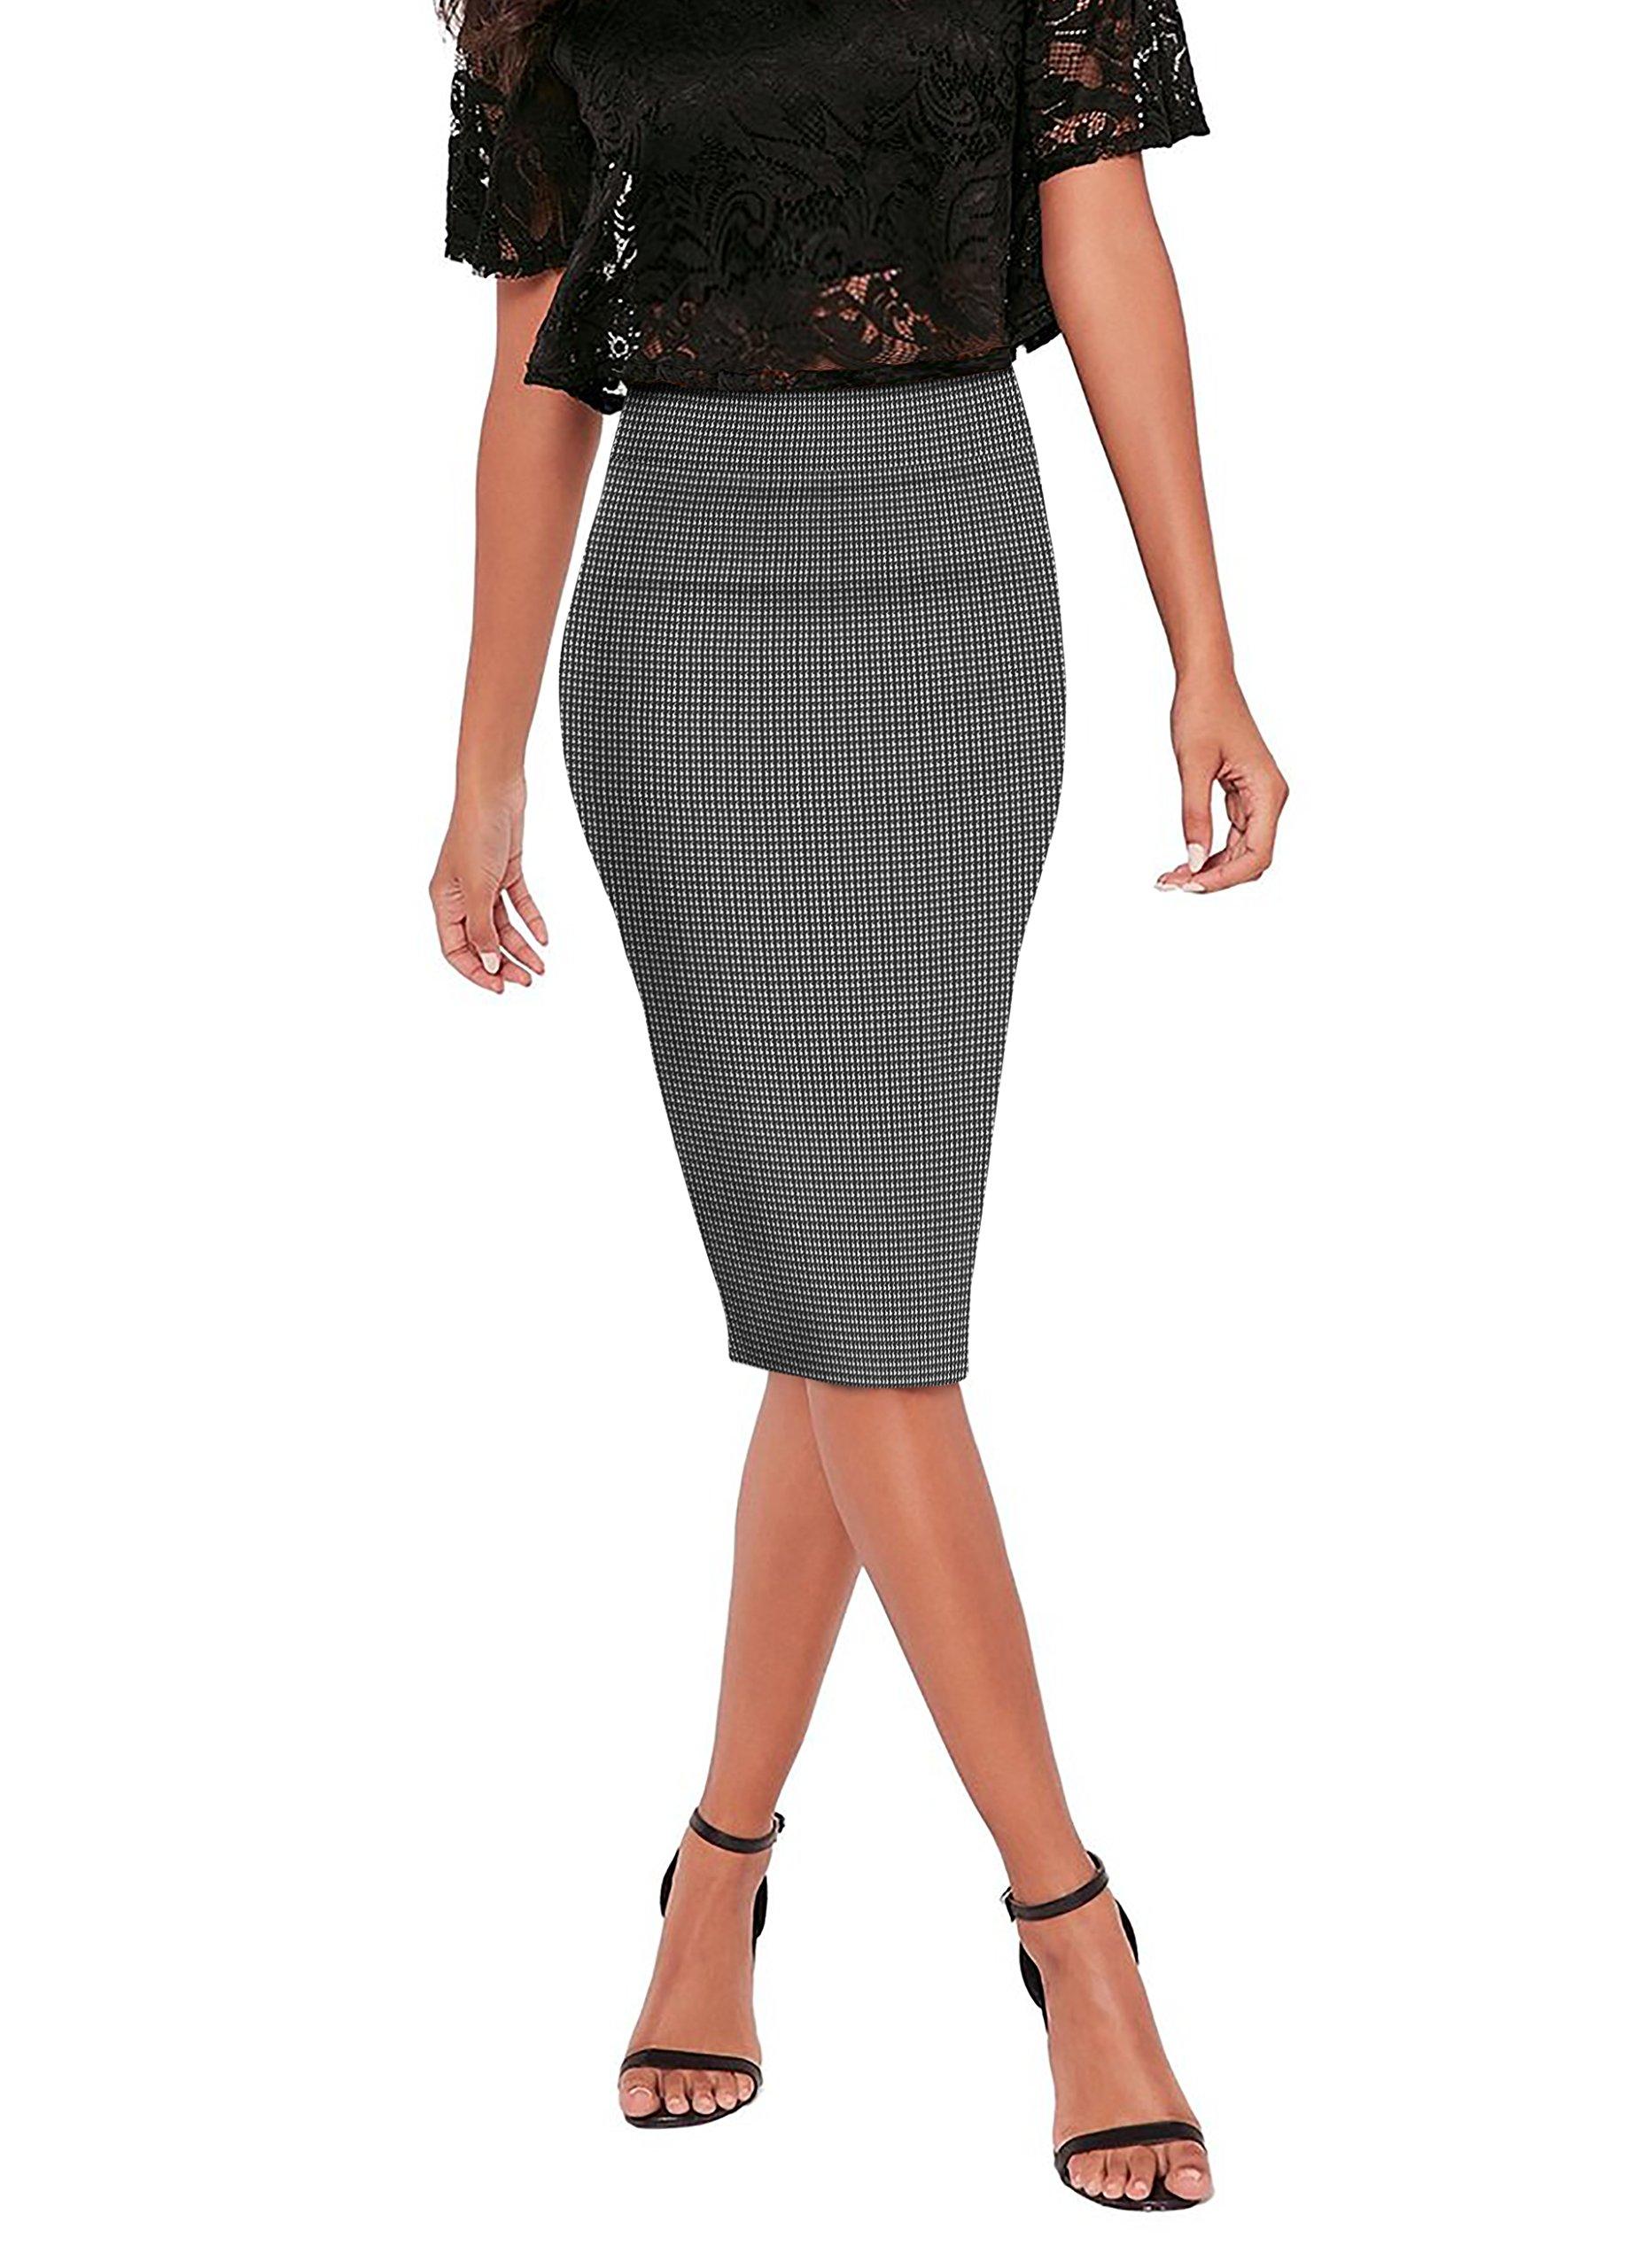 HyBrid & Company Womens Pencil Skirt for Office Wear KSK43584X 10690 Black/IVOR 1X by HyBrid & Company (Image #3)